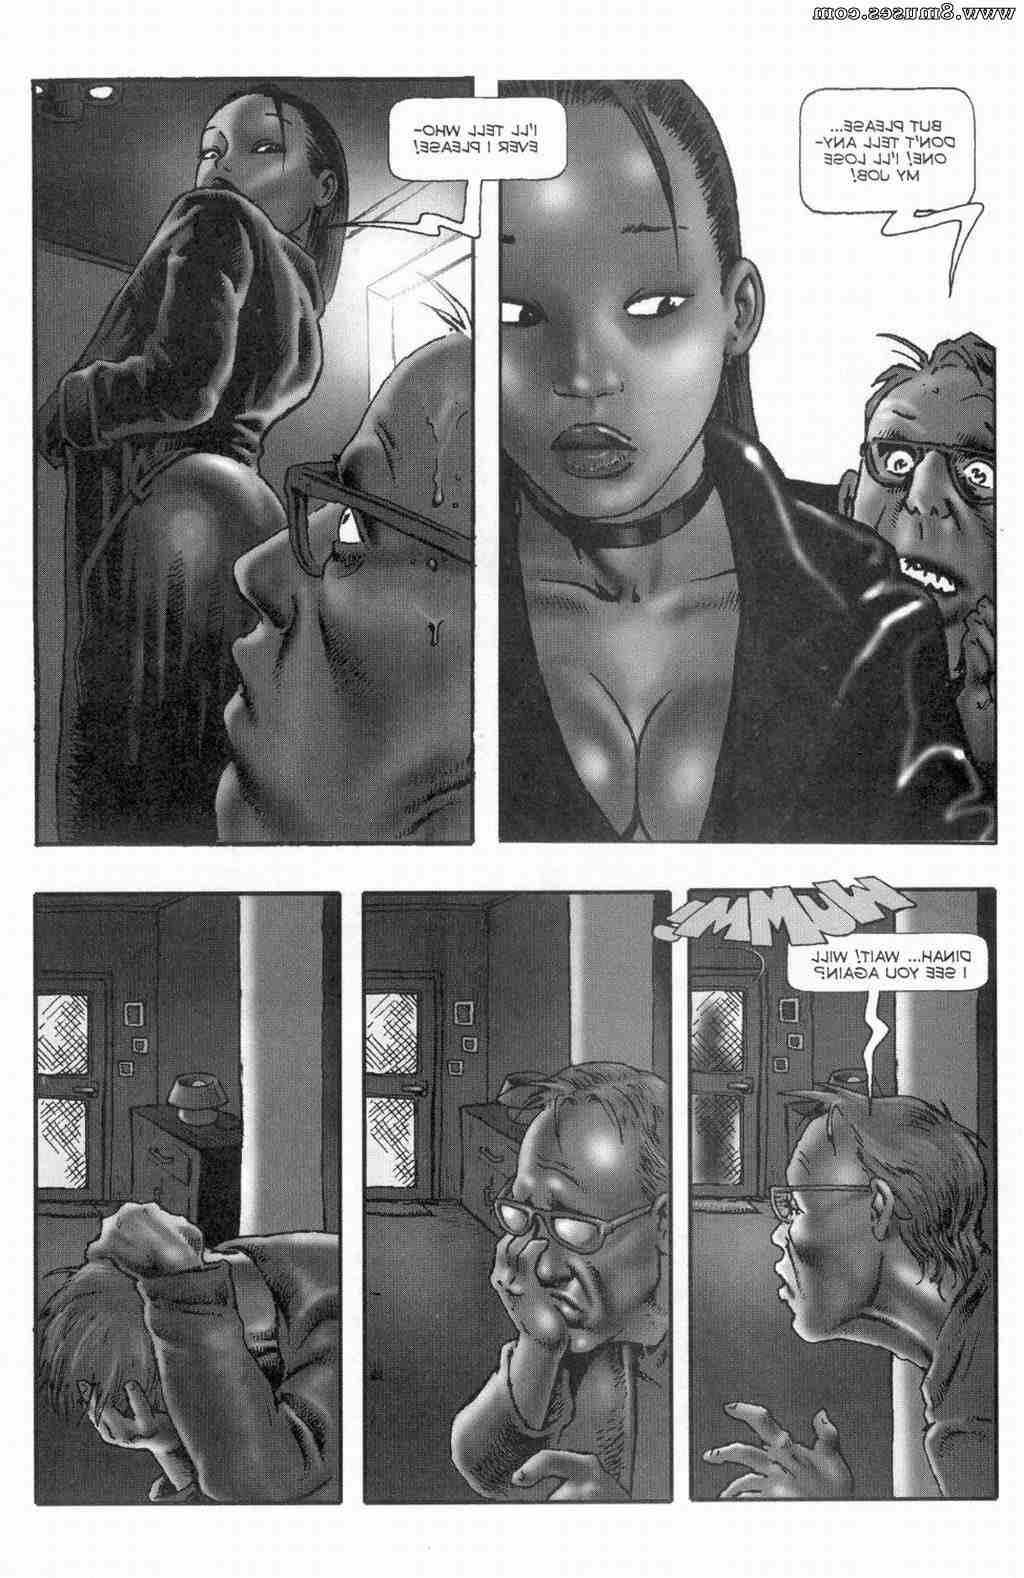 EROS-Comics/Alraune/Alraune-06 Alraune_06__8muses_-_Sex_and_Porn_Comics_17.jpg